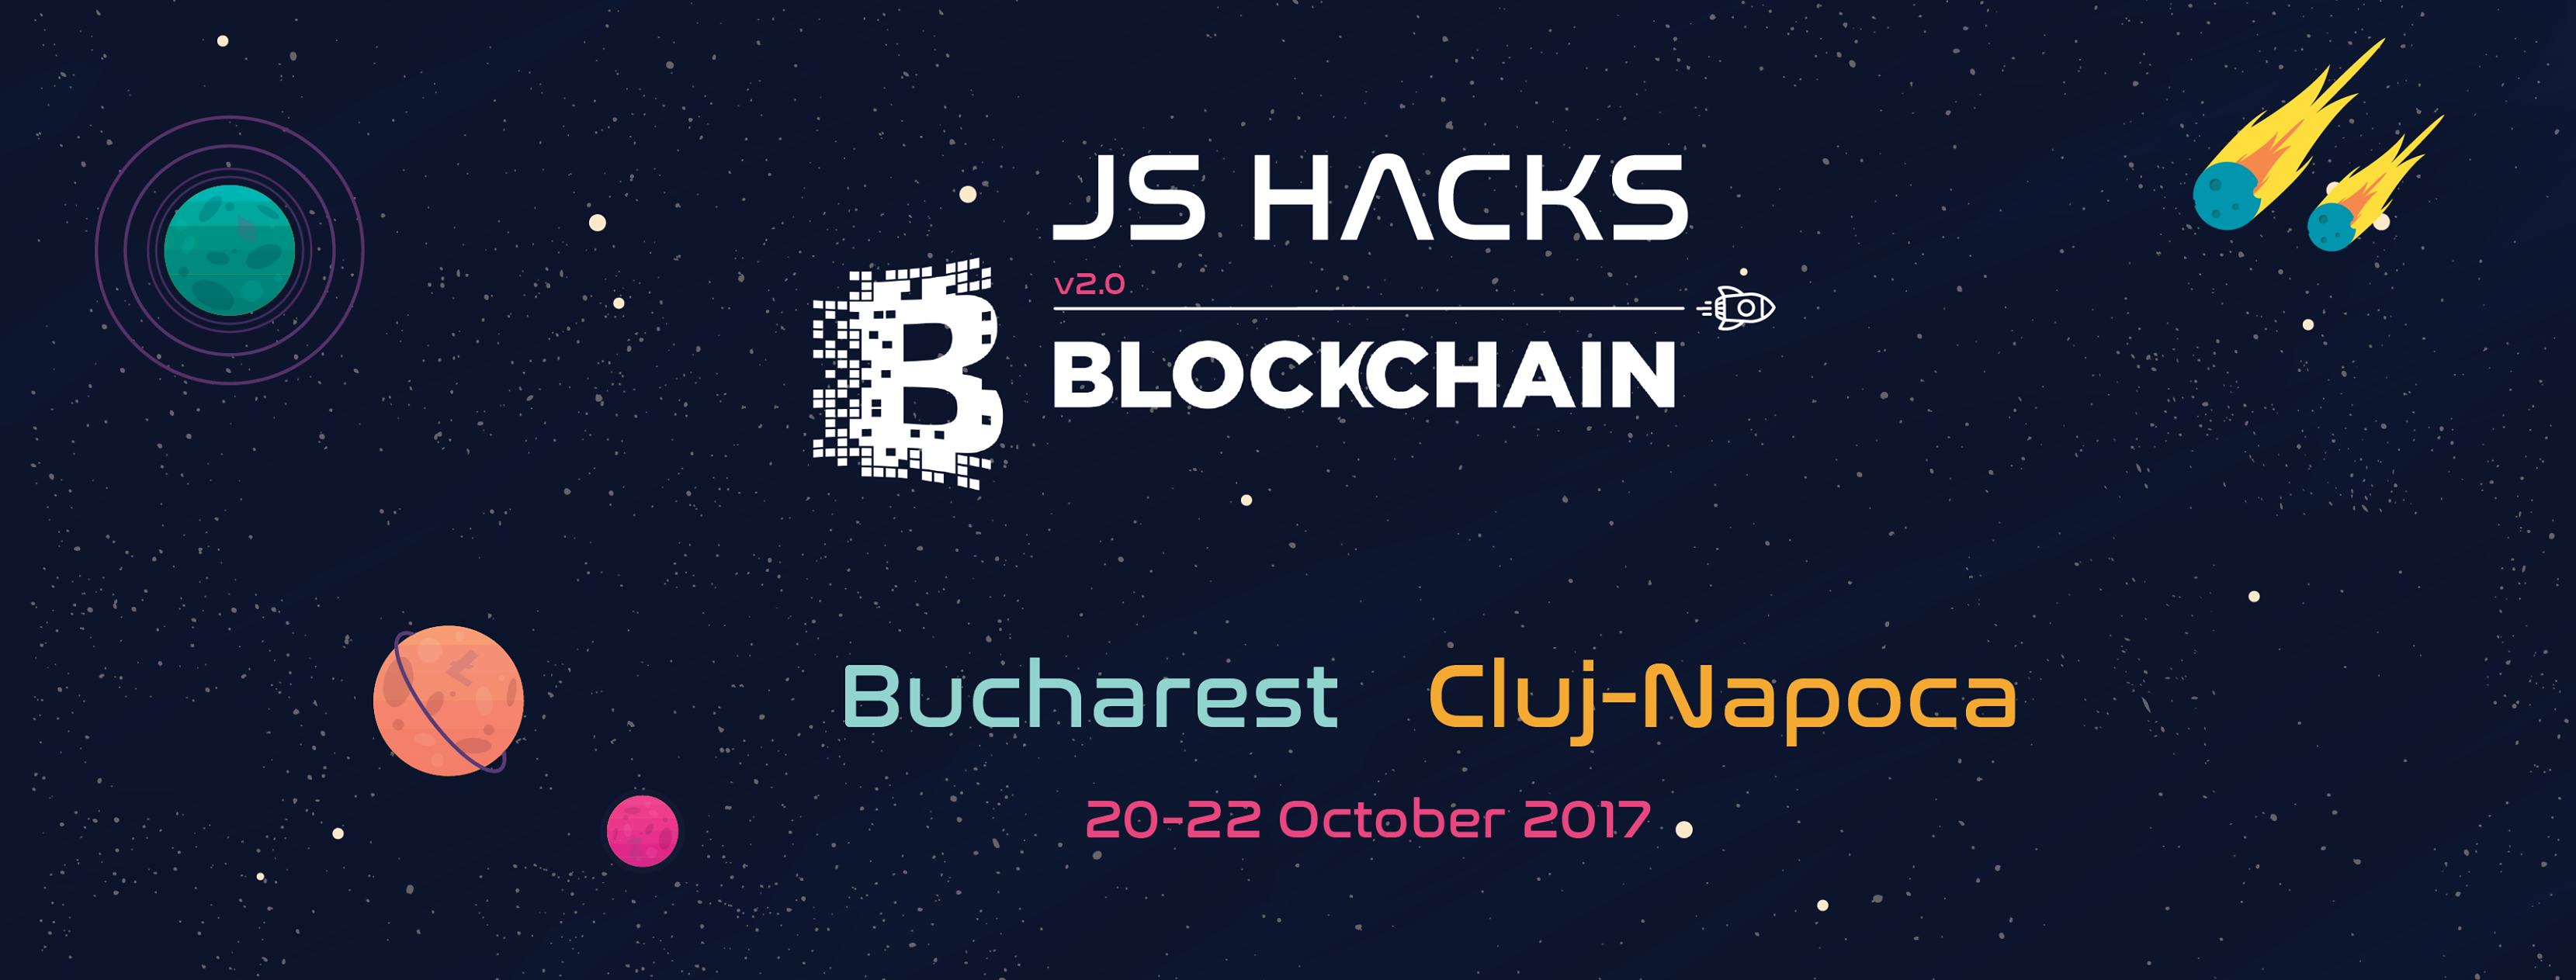 JSHacks2017_TheBlockchainEdition